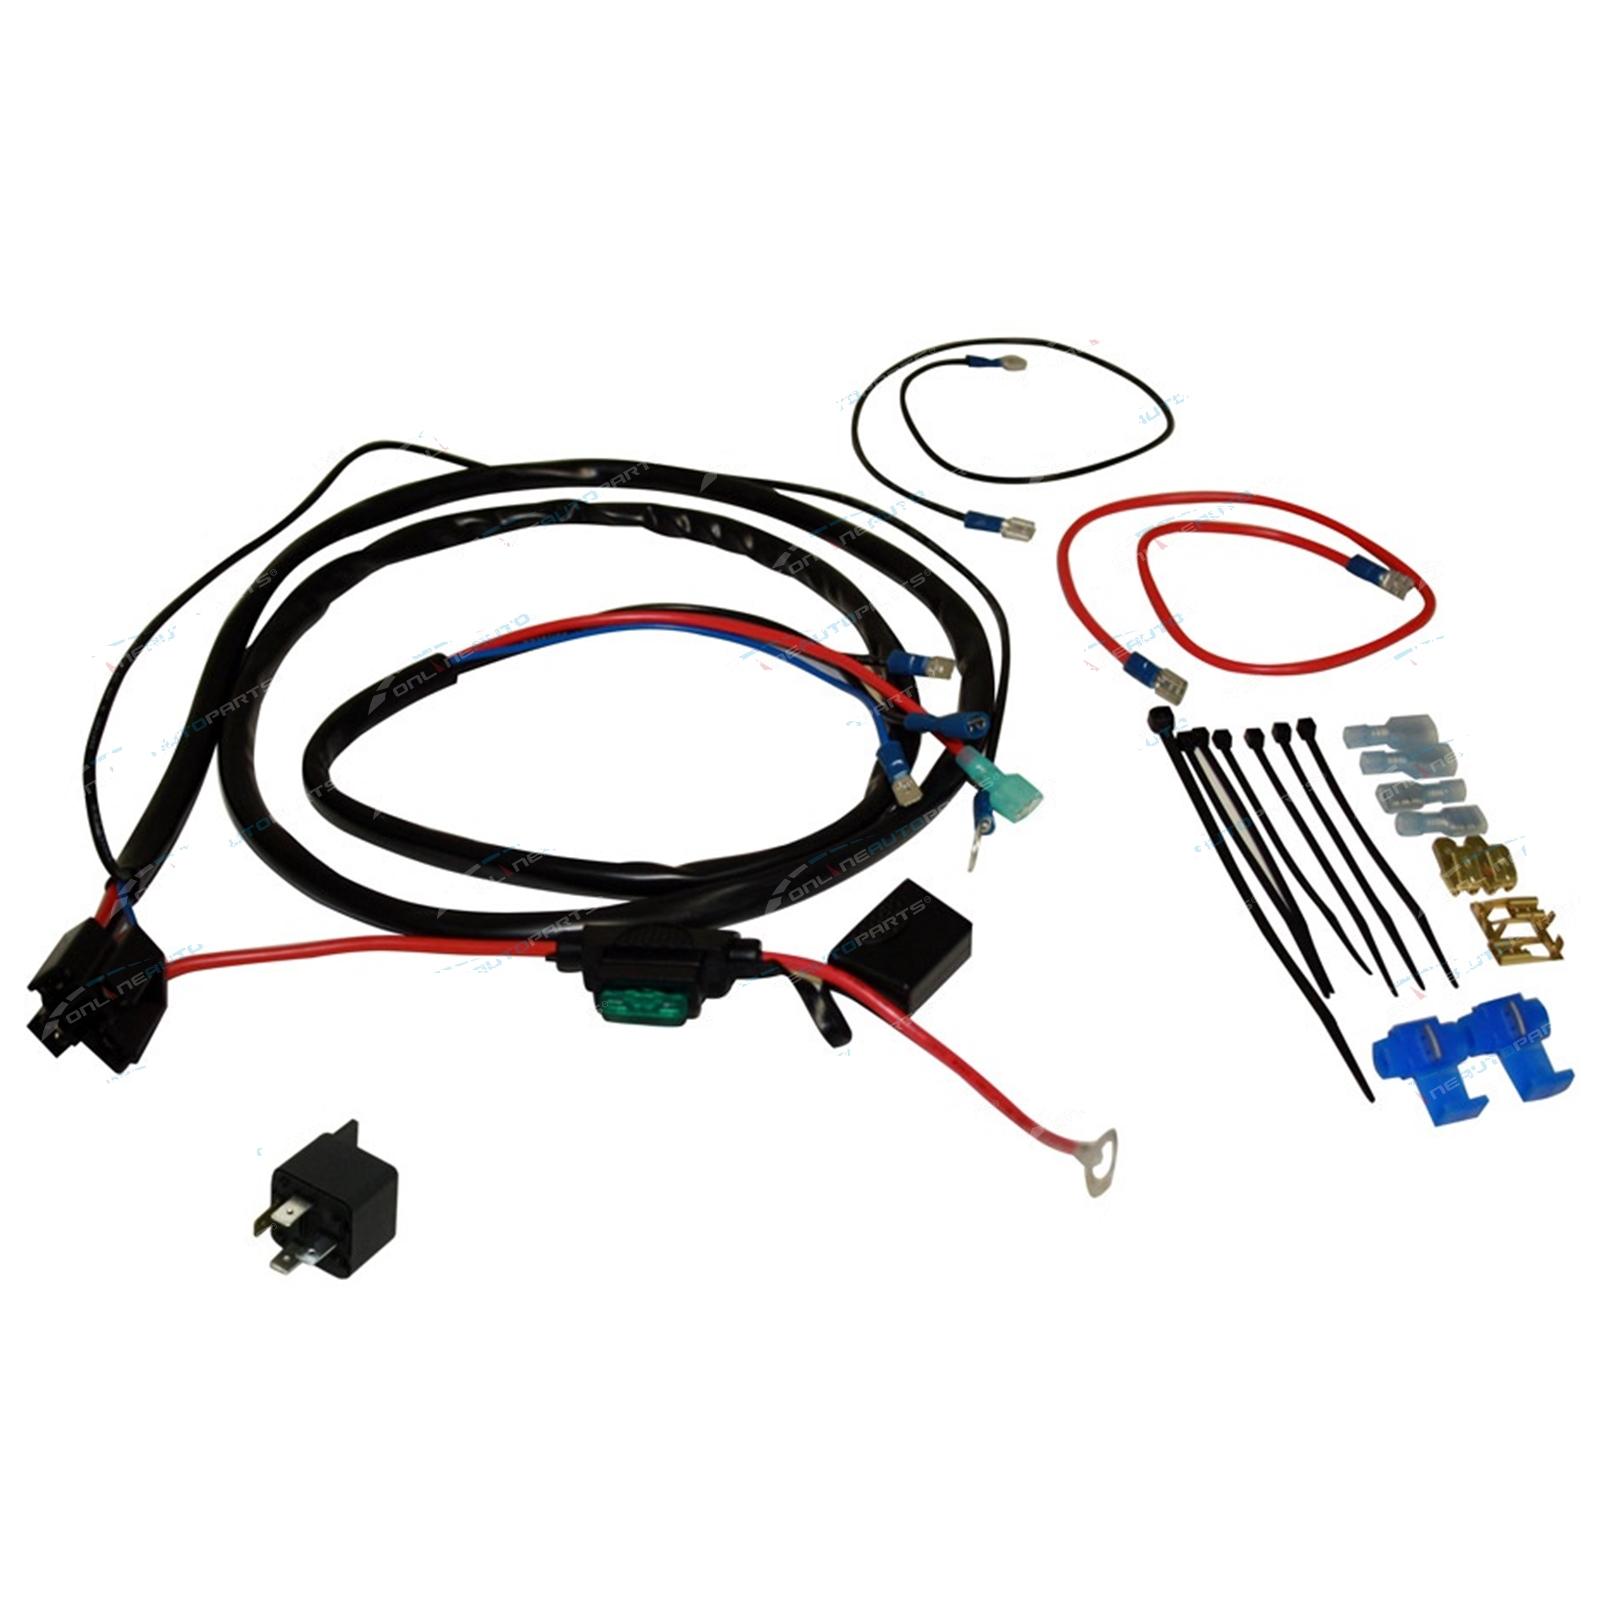 Basic Horn Or Lamp Wiring Kit Air Electric Car Bike Truck Incl Ne